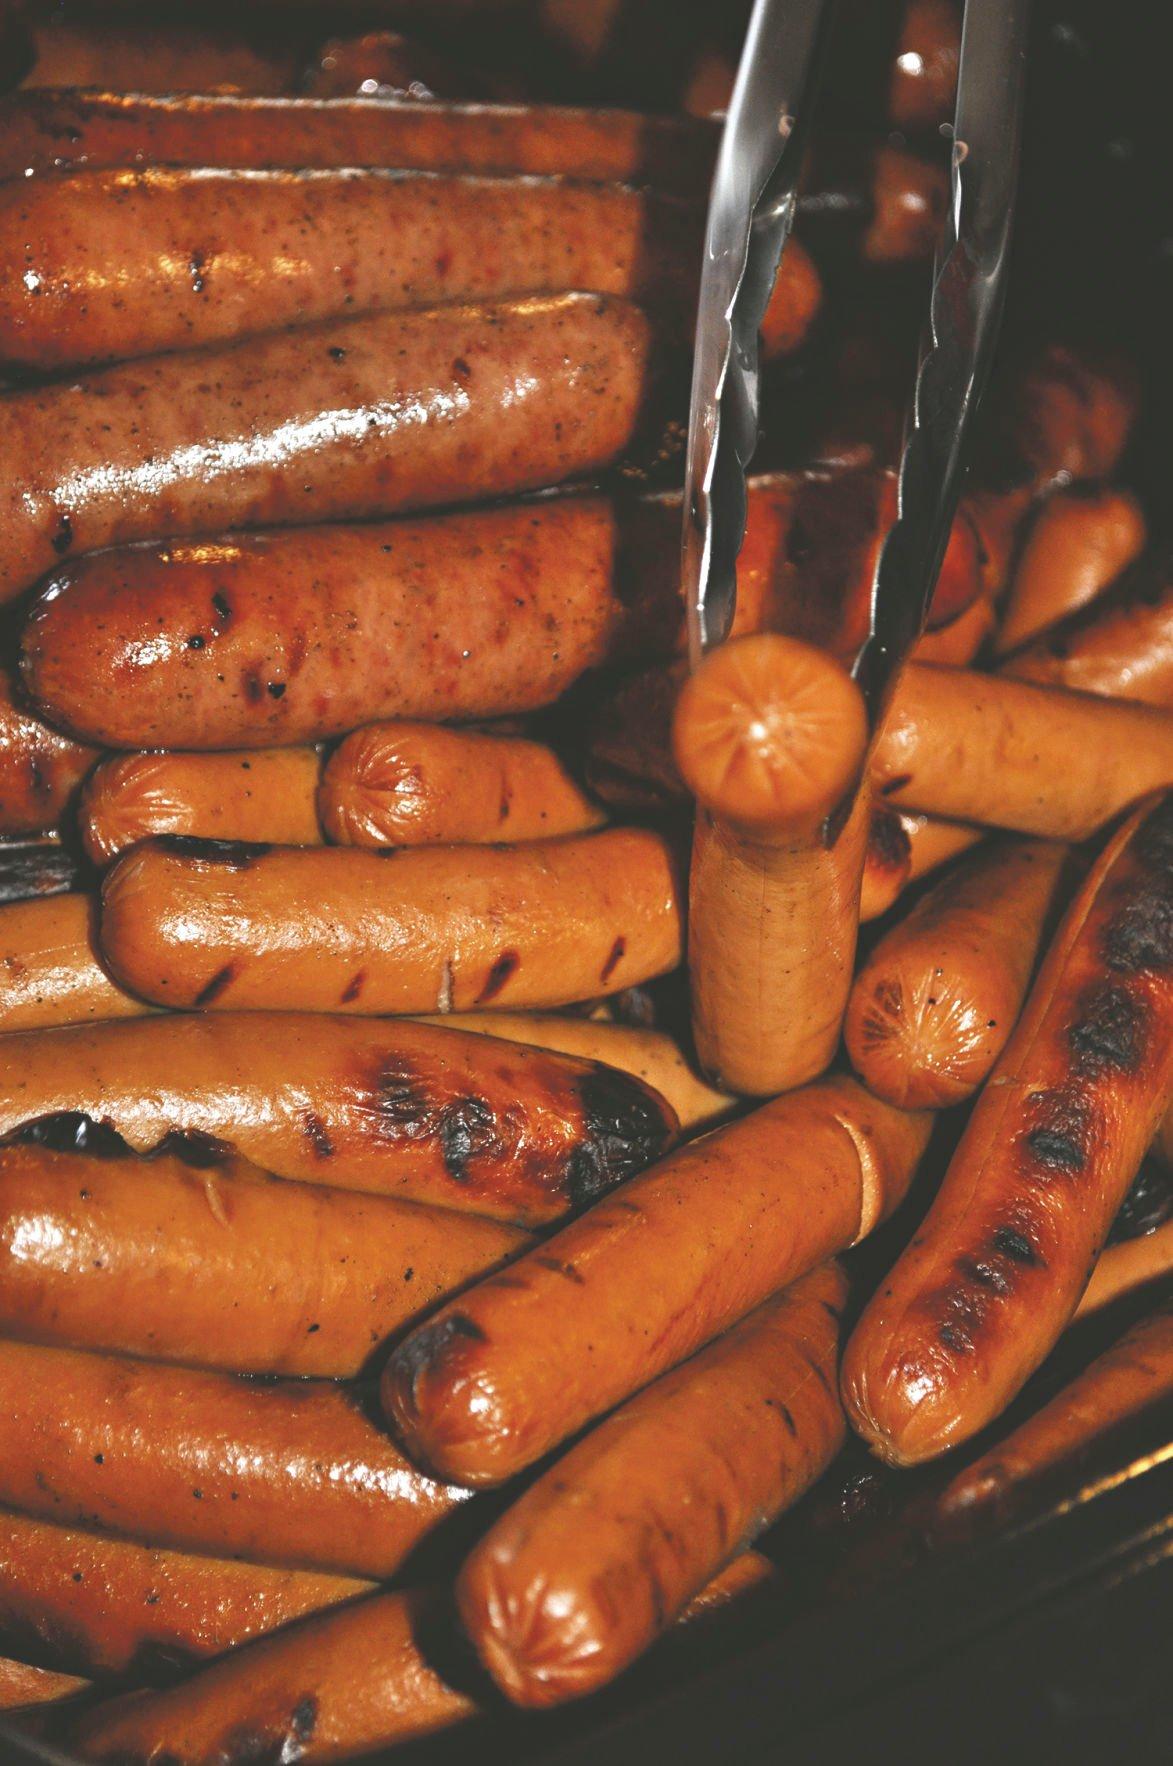 hotdogs_brats_redux.jpg